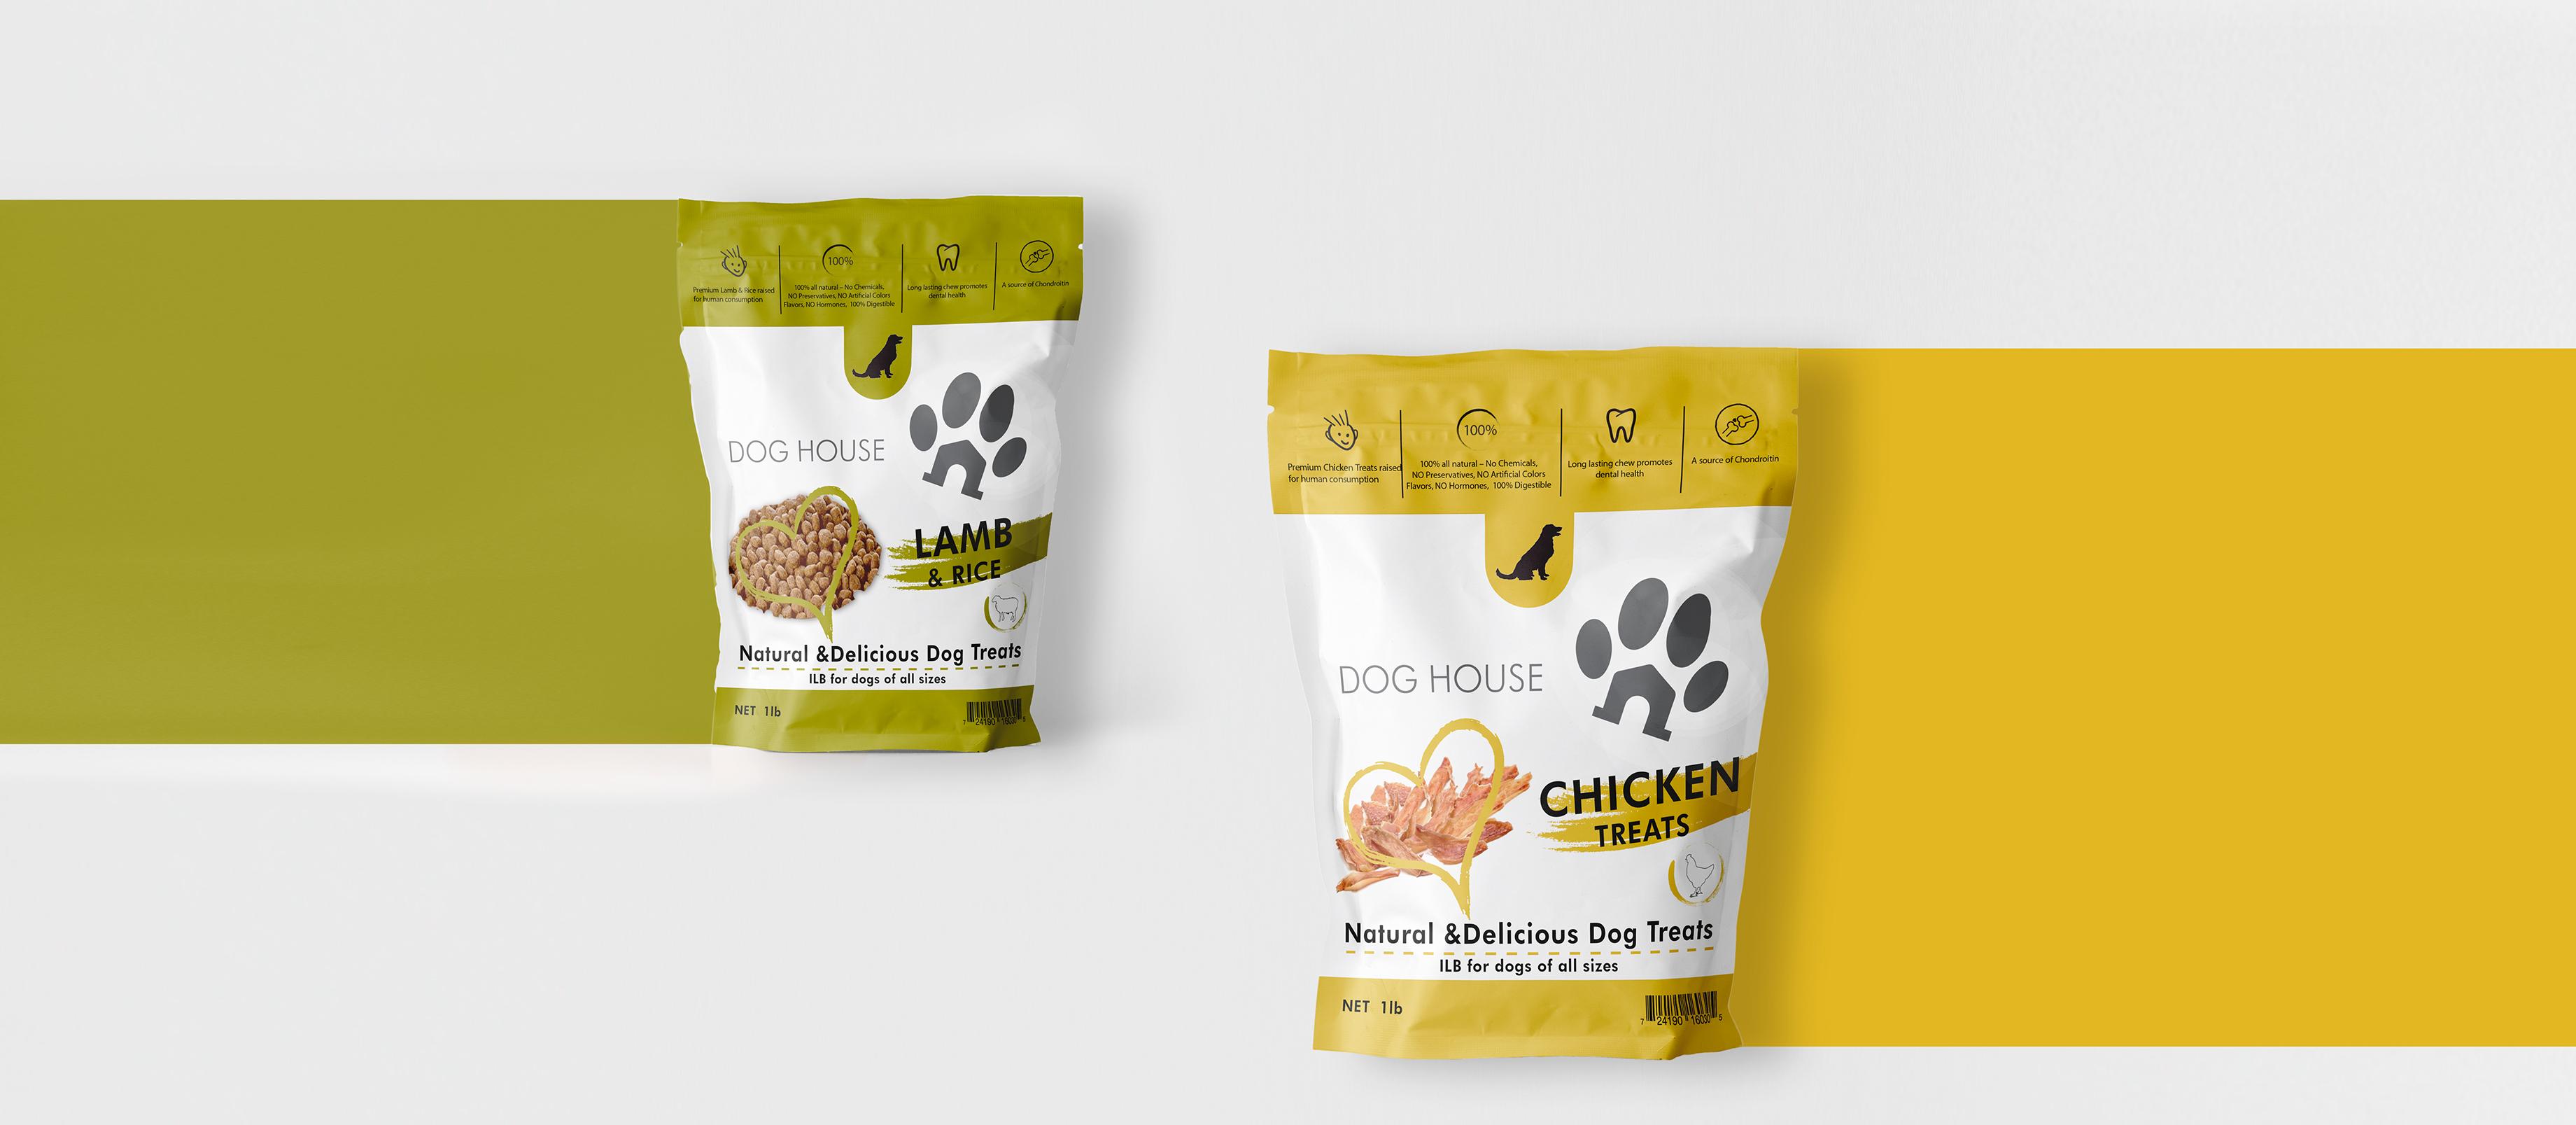 Food packaging design  https://www.linkedin.com/in/martin-andonov-445148163/